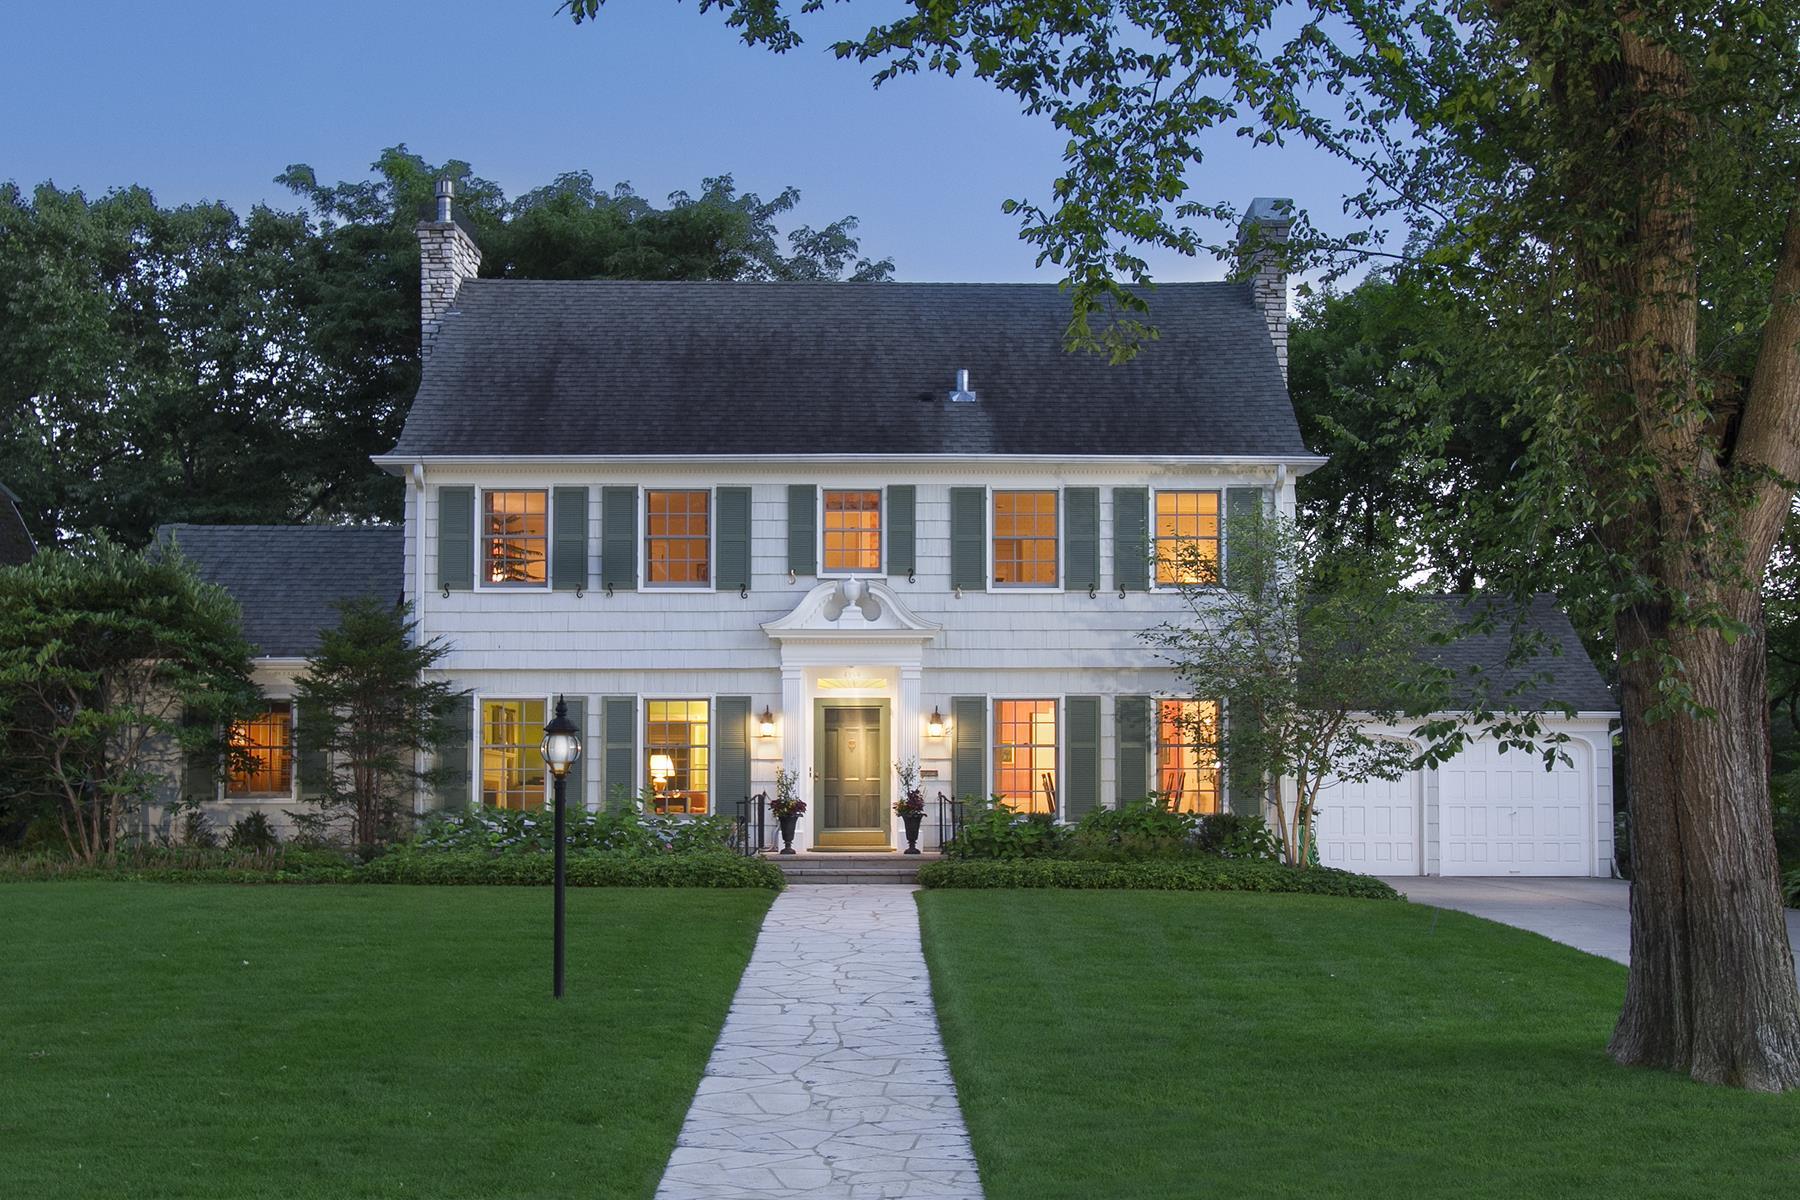 Single Family Home for Sale at 4520 Browndale Avenue Edina, Minnesota 55424 United States